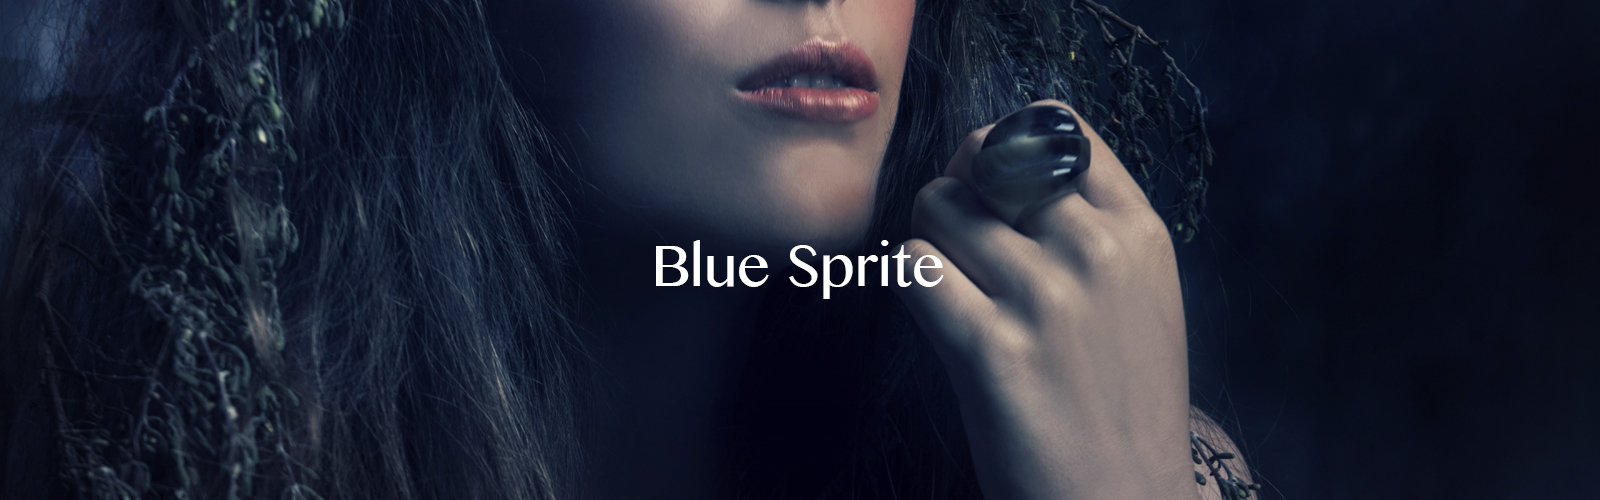 Blue Sprite Header with text